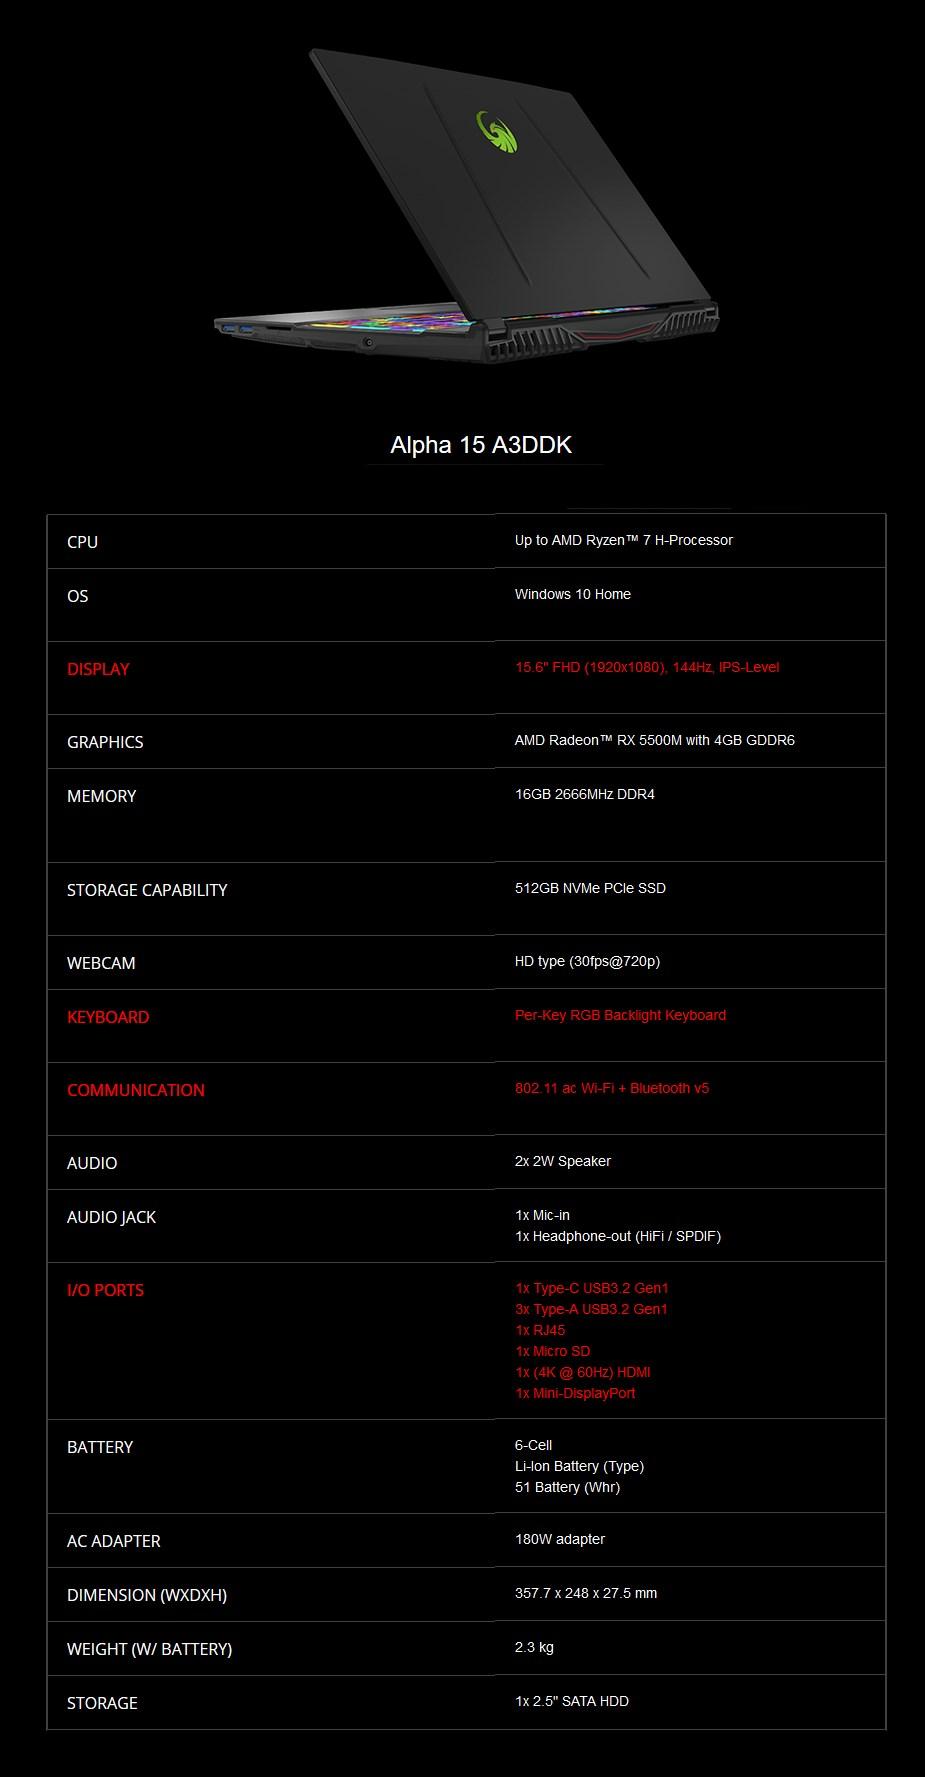 "MSI Alpha 15 A3DDK 15.6"" 120Hz Gaming Laptop R7-3750H 16GB 512GB RX 5500M W10H - Overview 2"